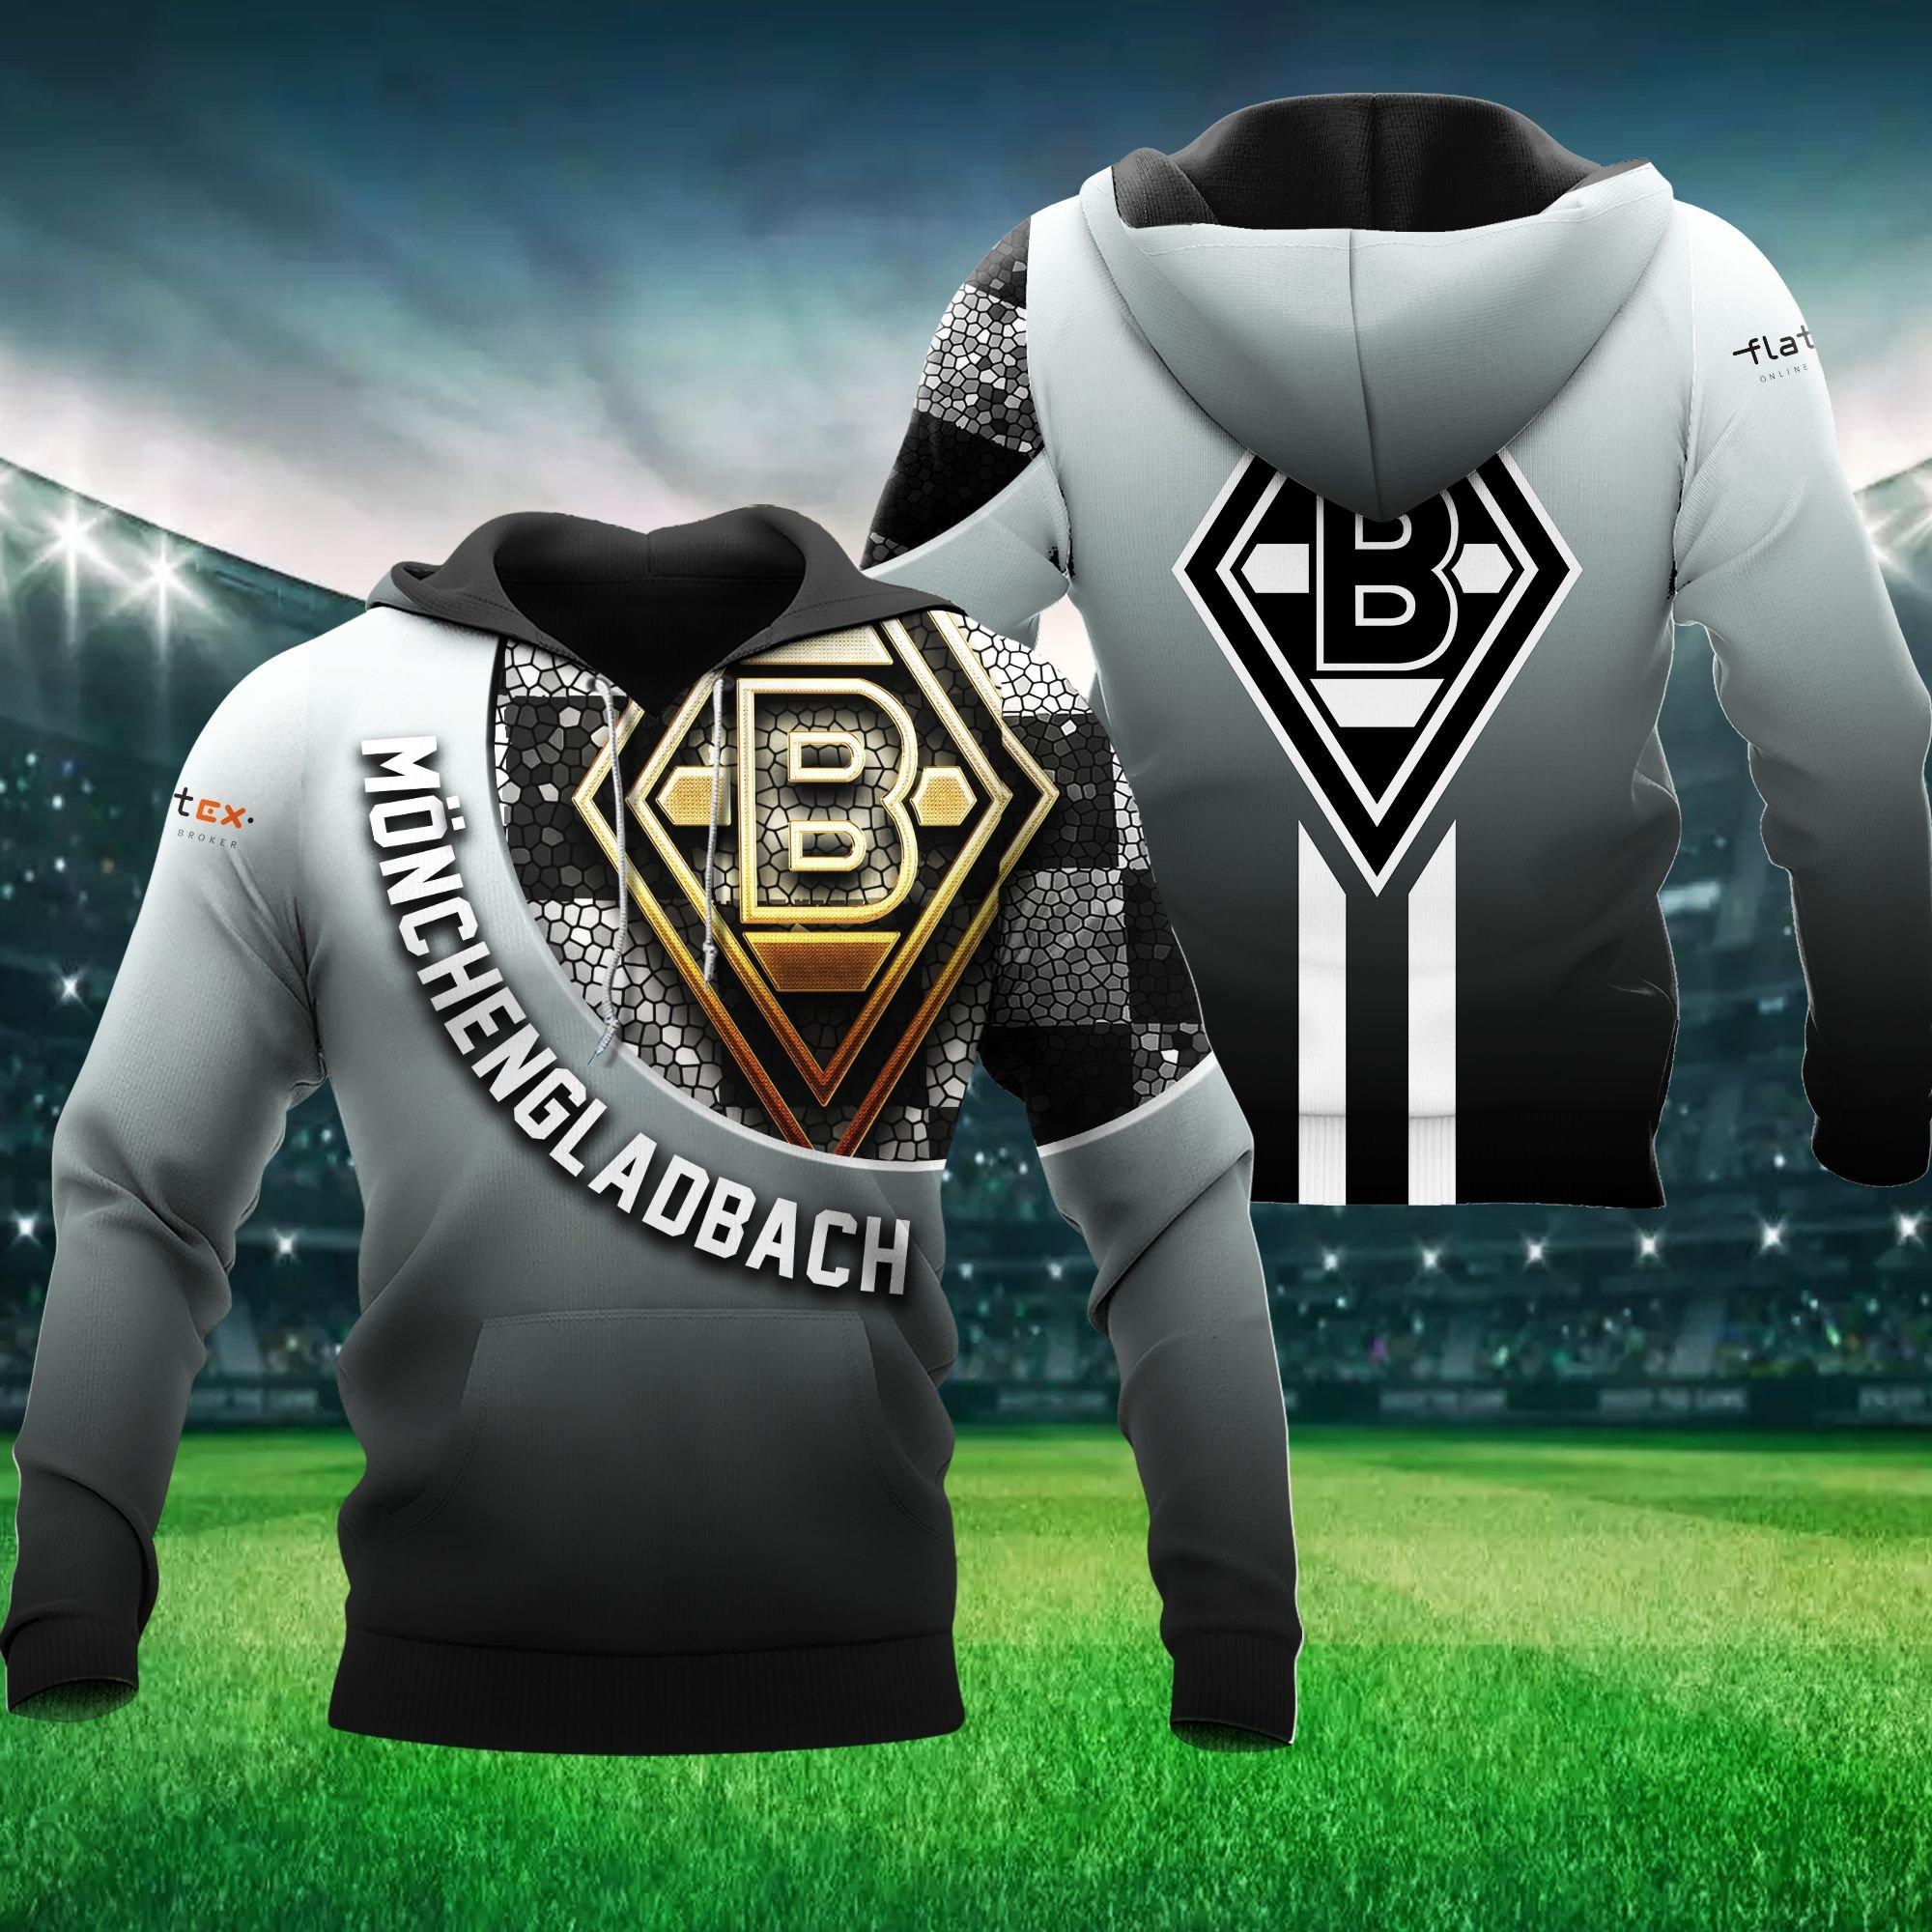 Monchengl Adbach 3D hoodie